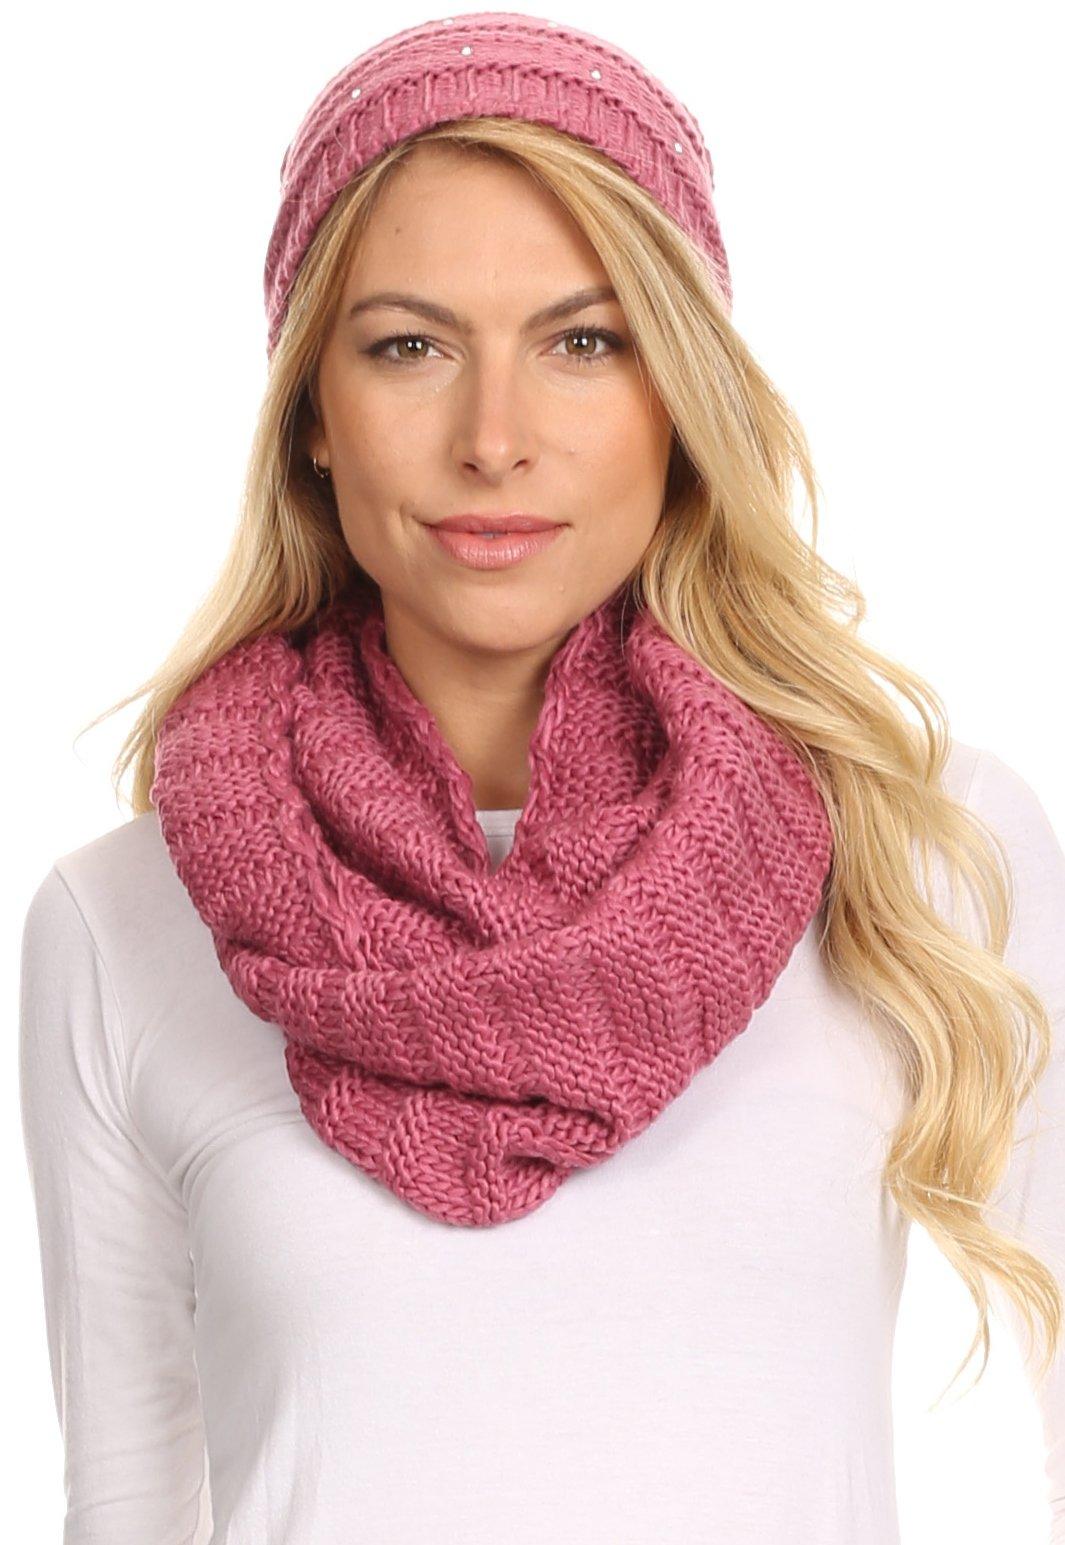 Sakkas 16141 - Sayla Rhinestone Jewel Soft Warm Woven Cable Knit Beanie Hat And Scarf Set - Rose - OS